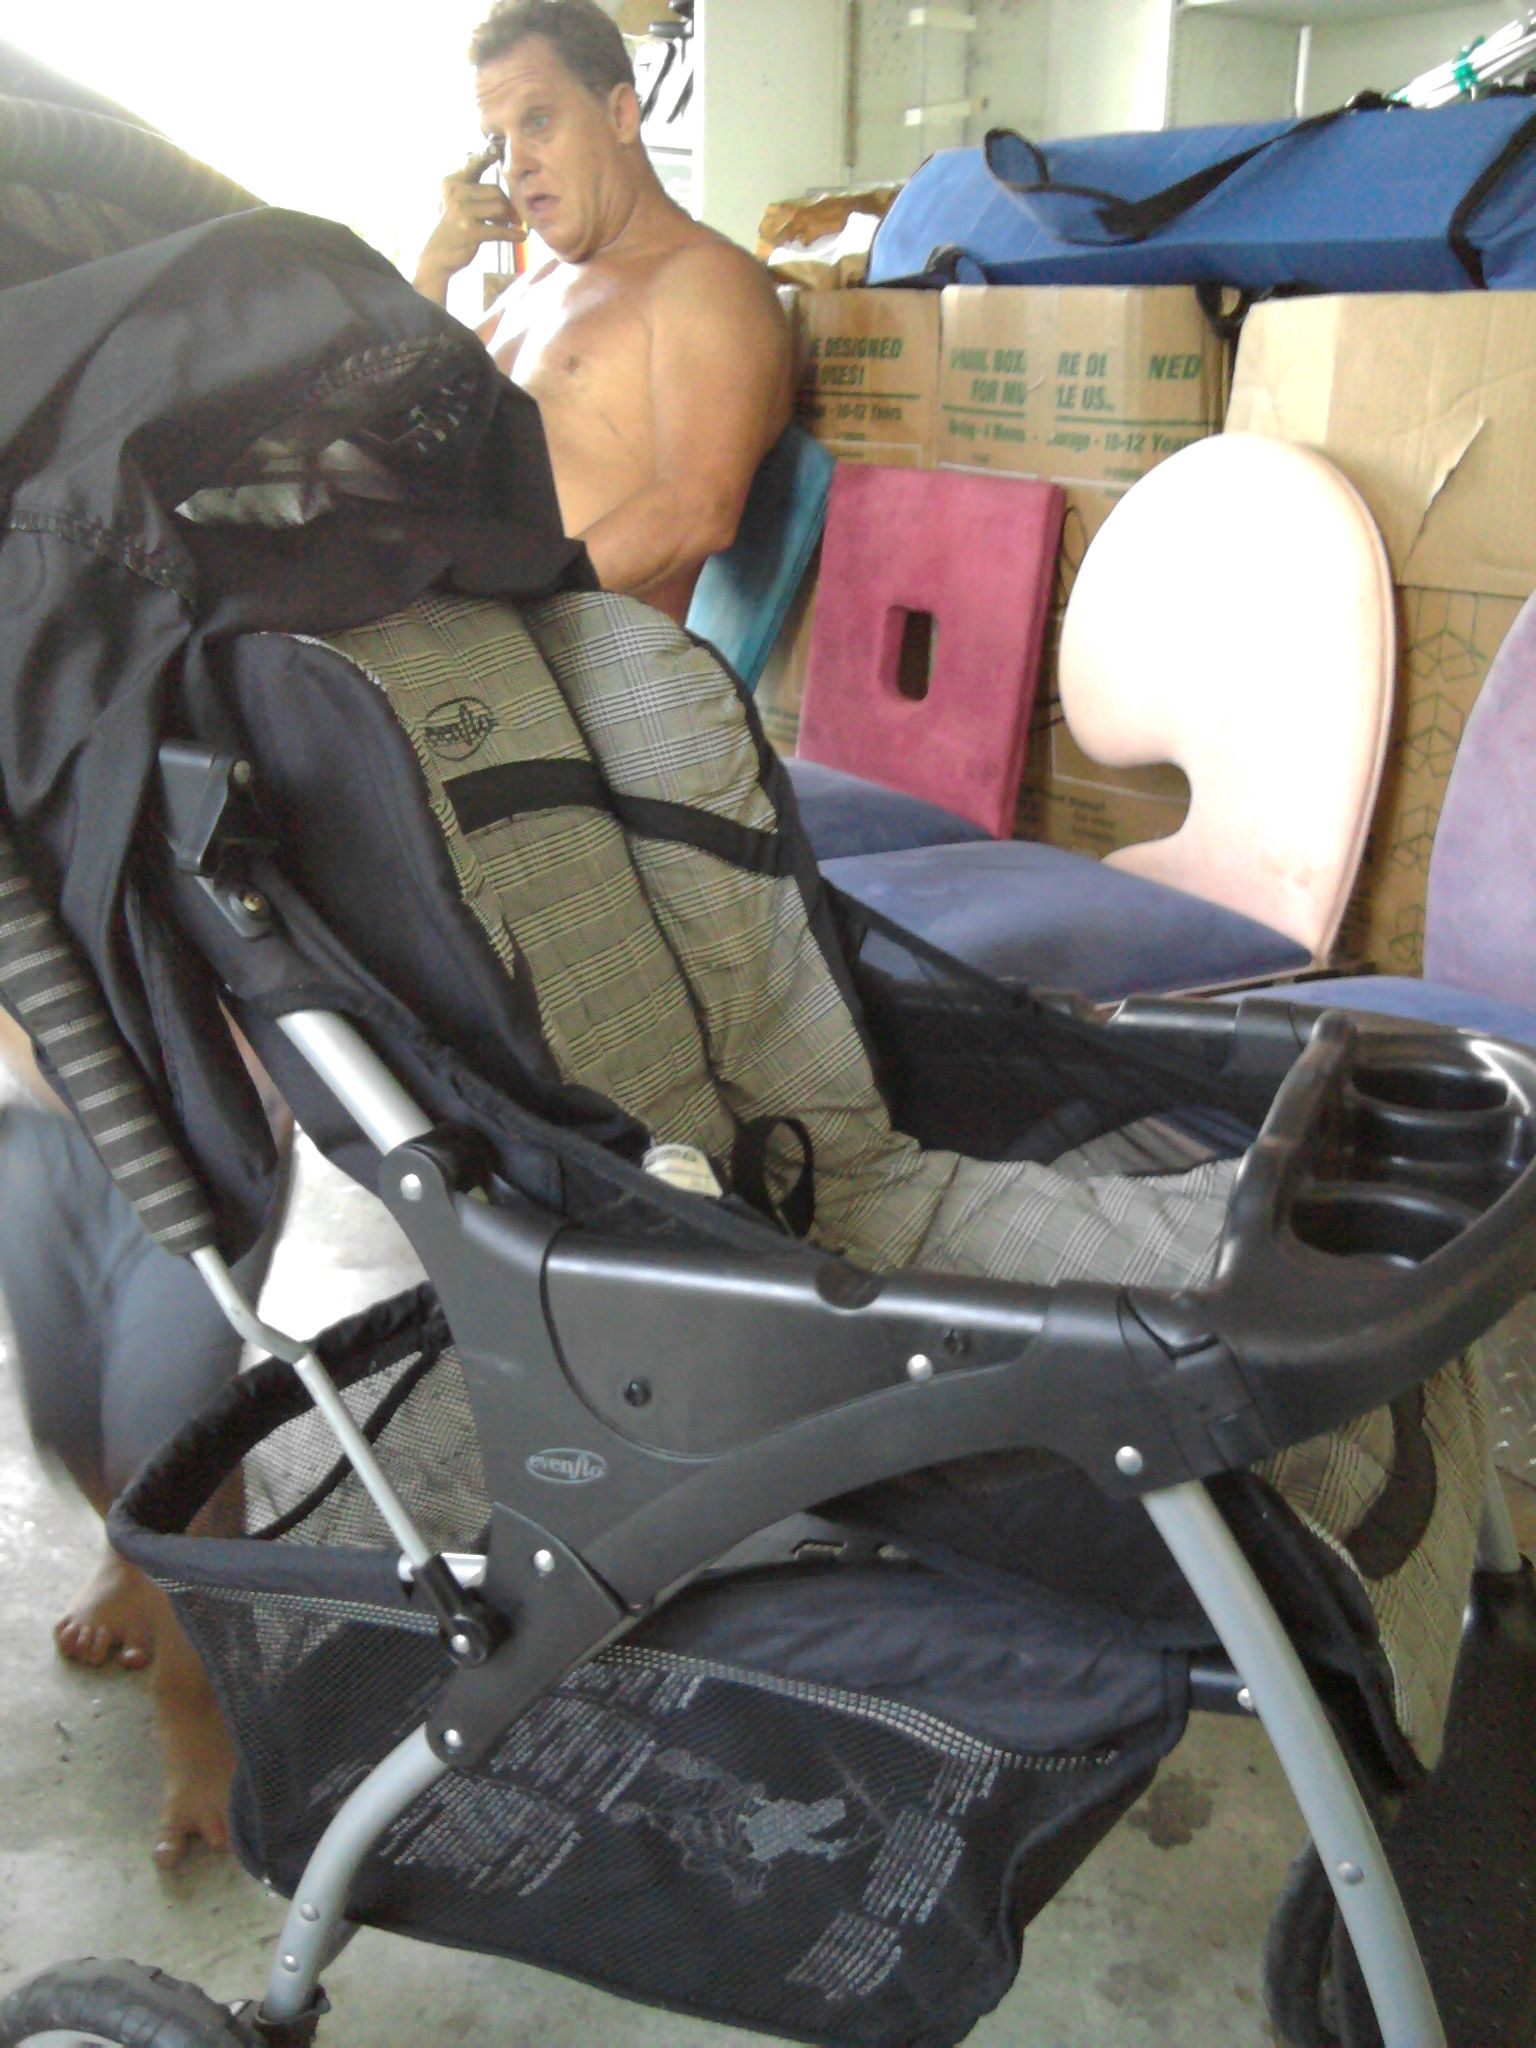 Evenflo Stroller in krystalnance's Garage Sale Oakland